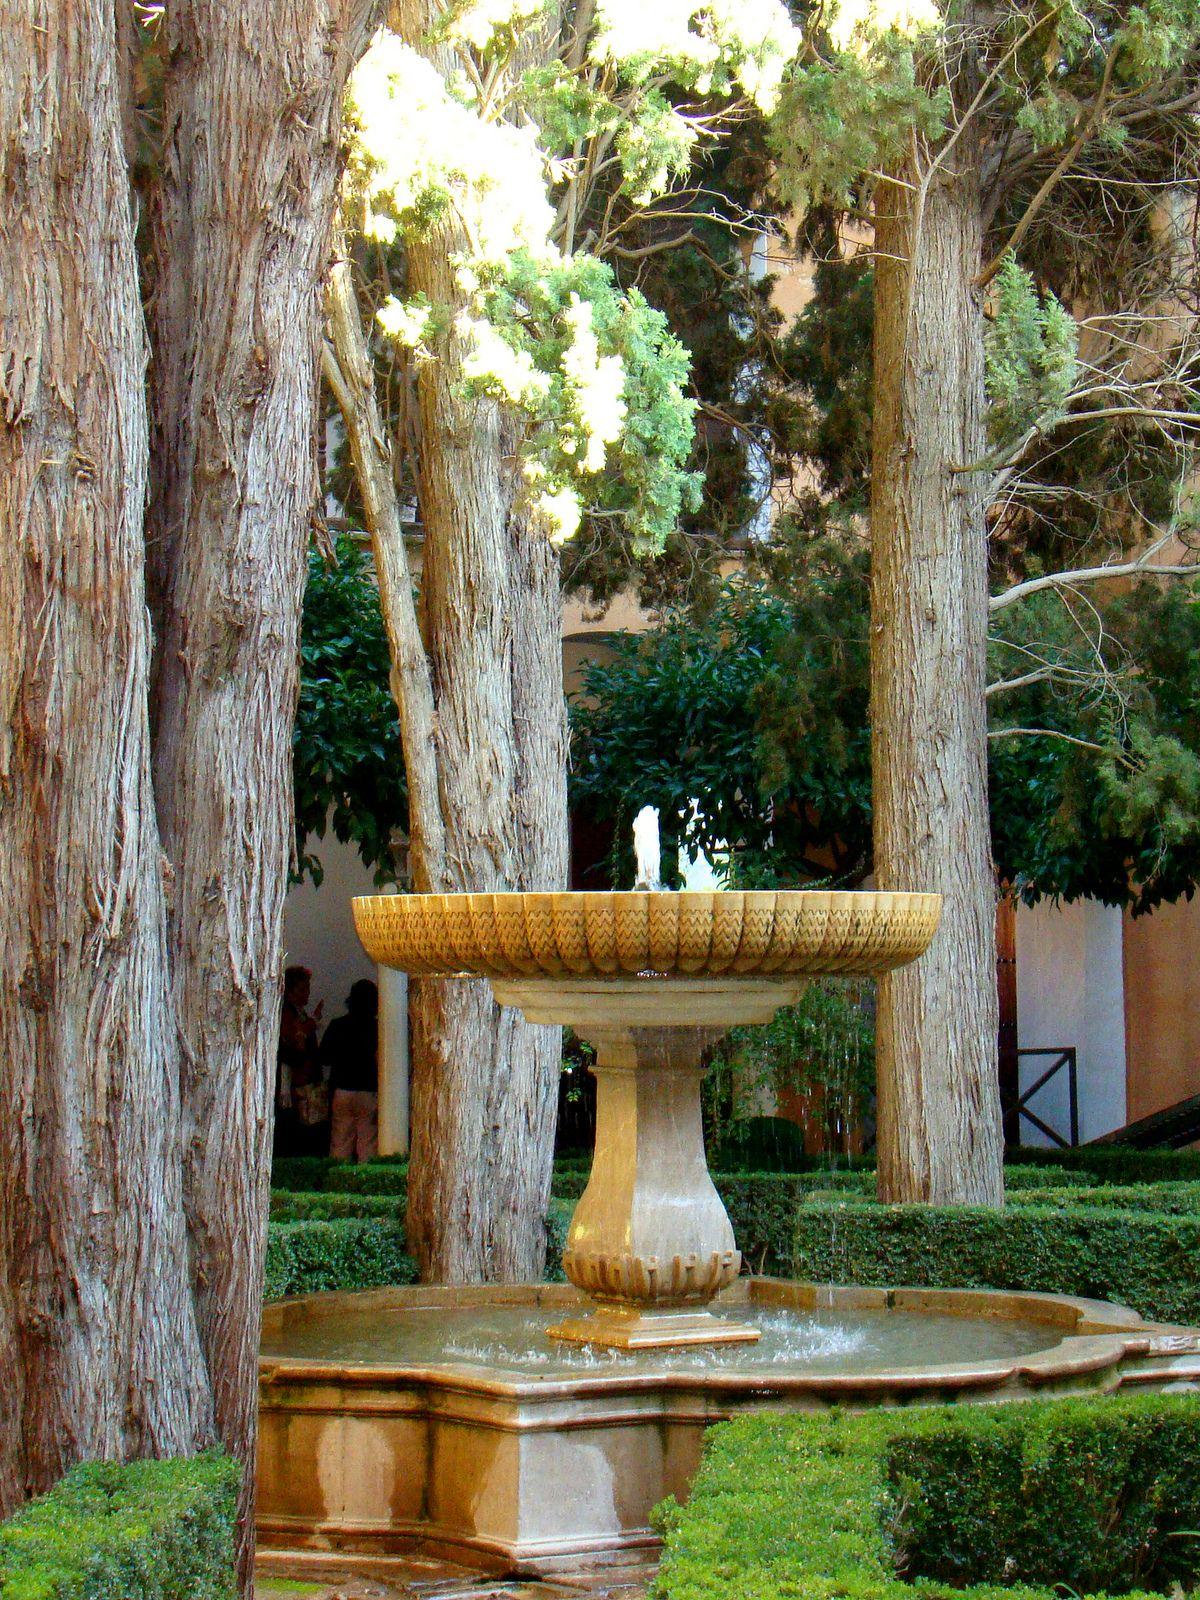 La Alhambra - Granada - Spain